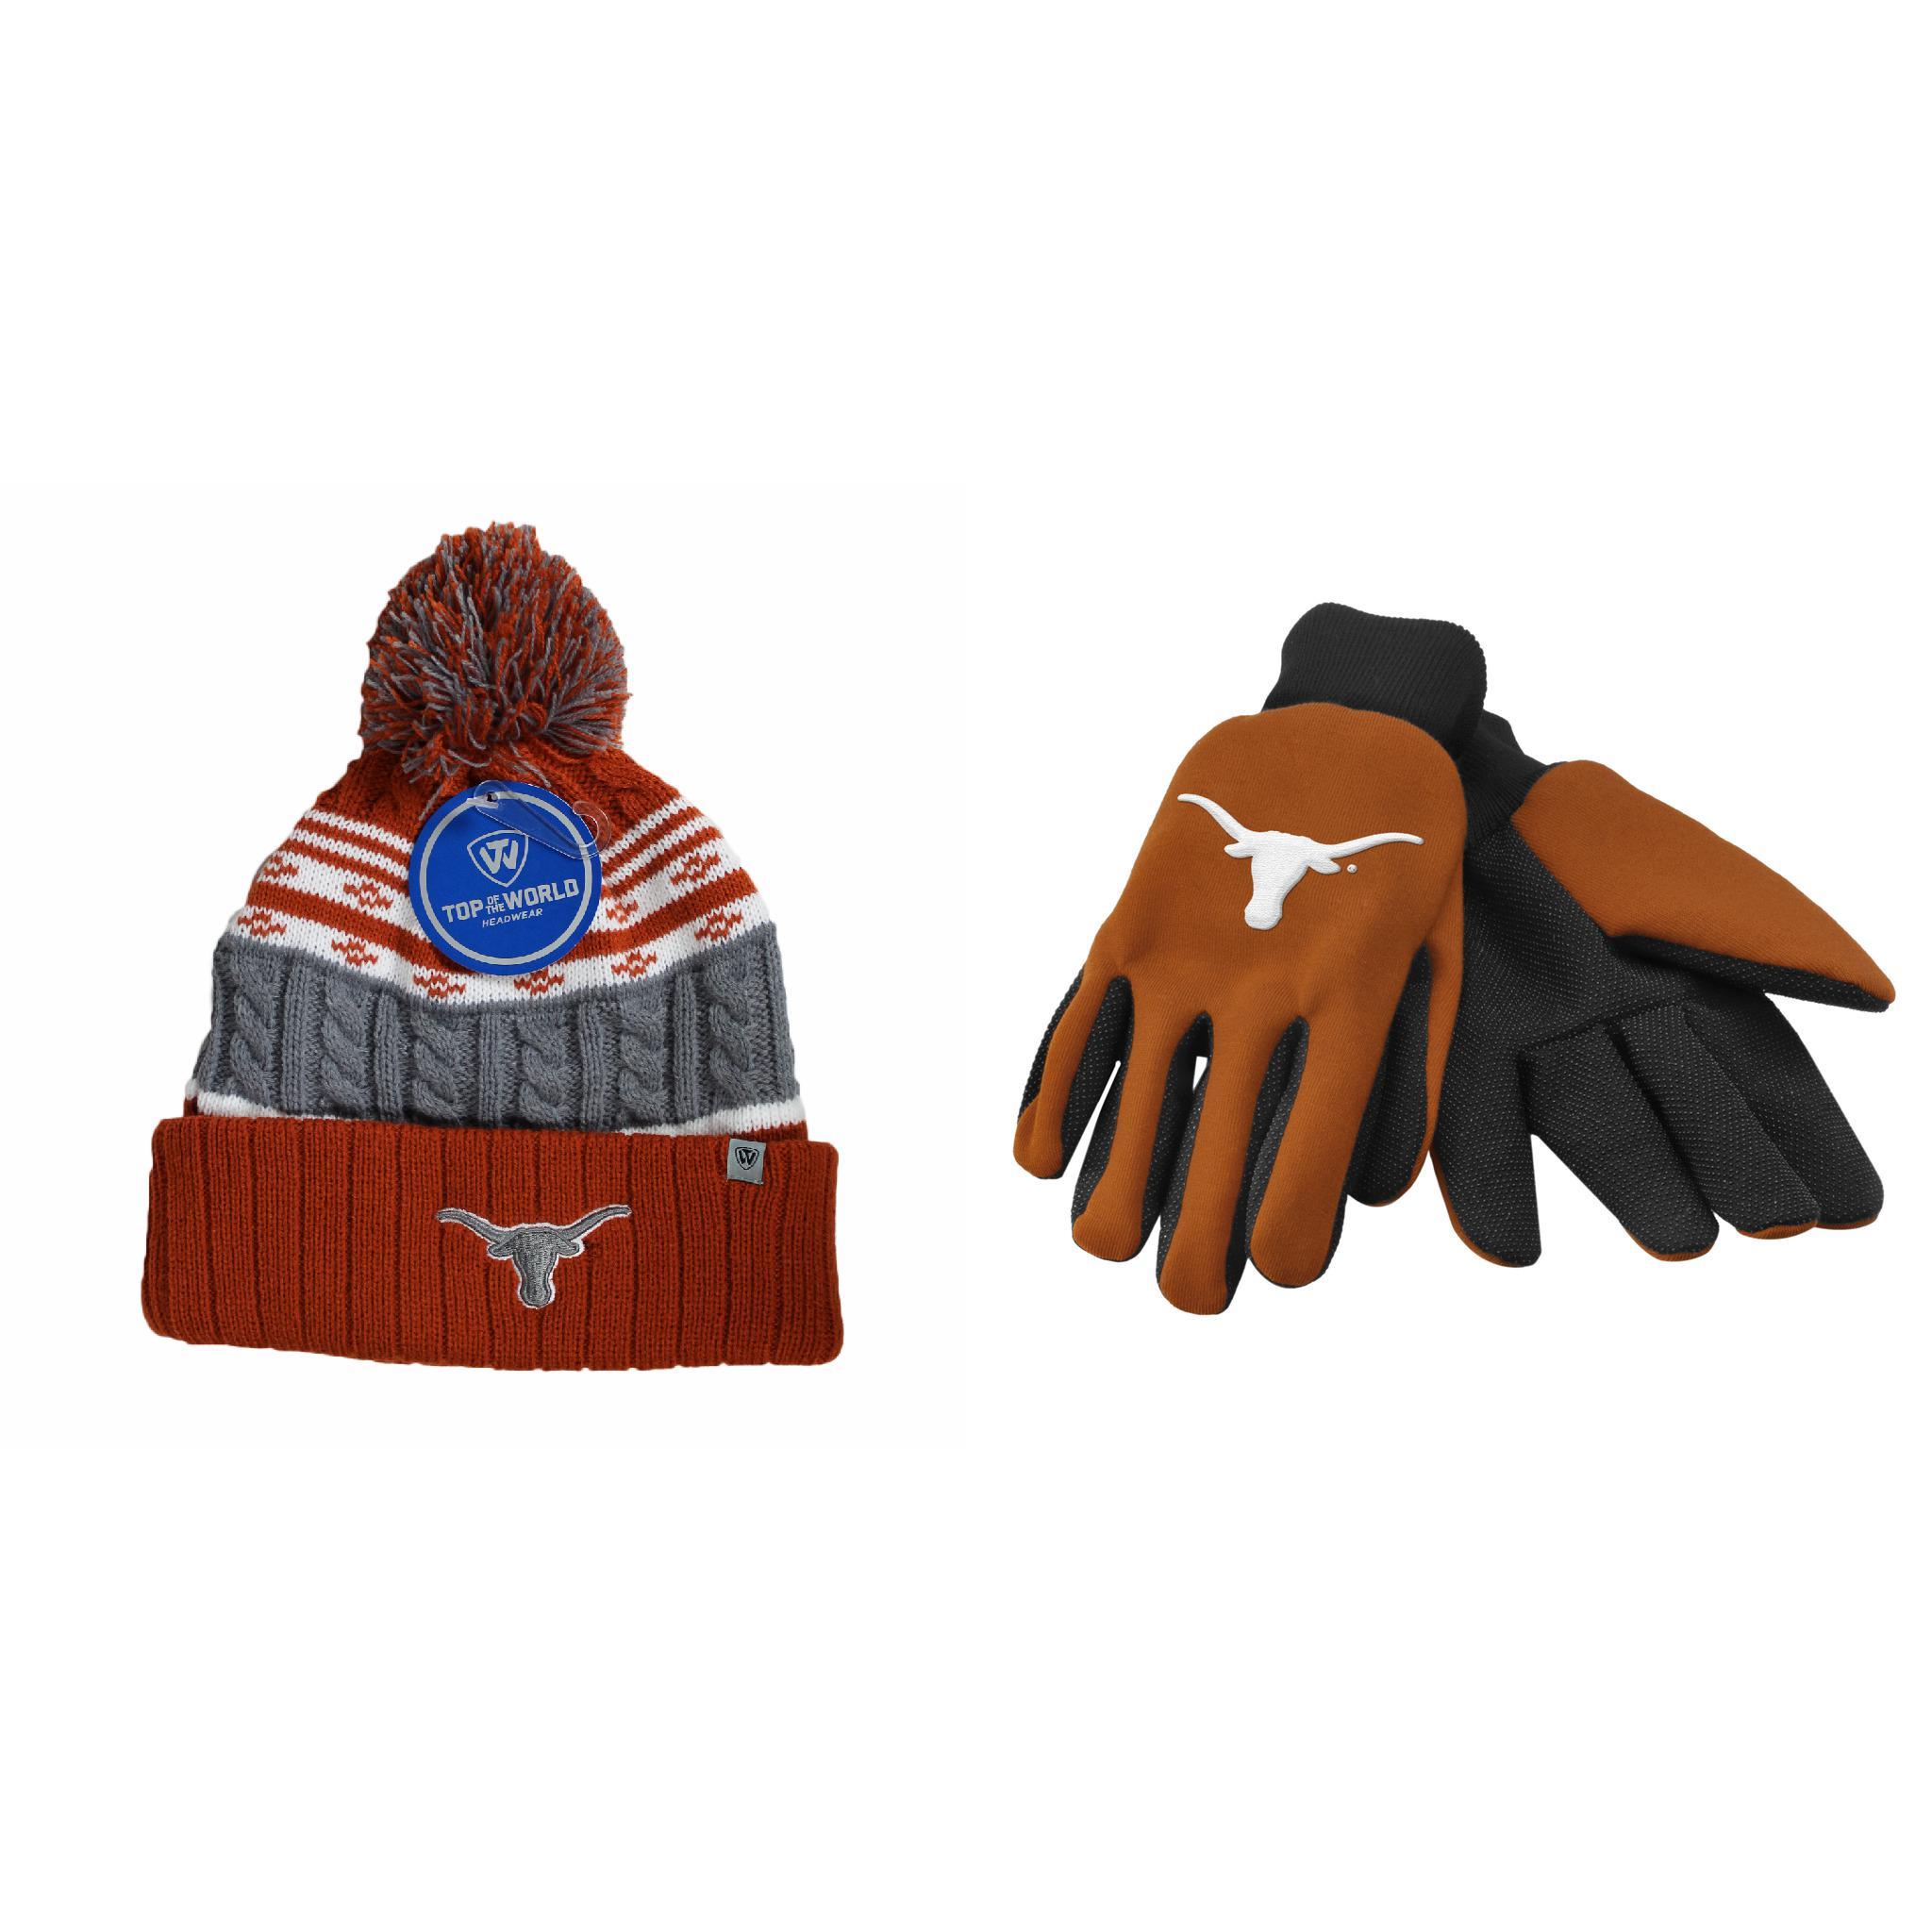 NCAA Texas Longhorns Grip Work Glove And Altitude Beanie Hat 2 Pack Bundle